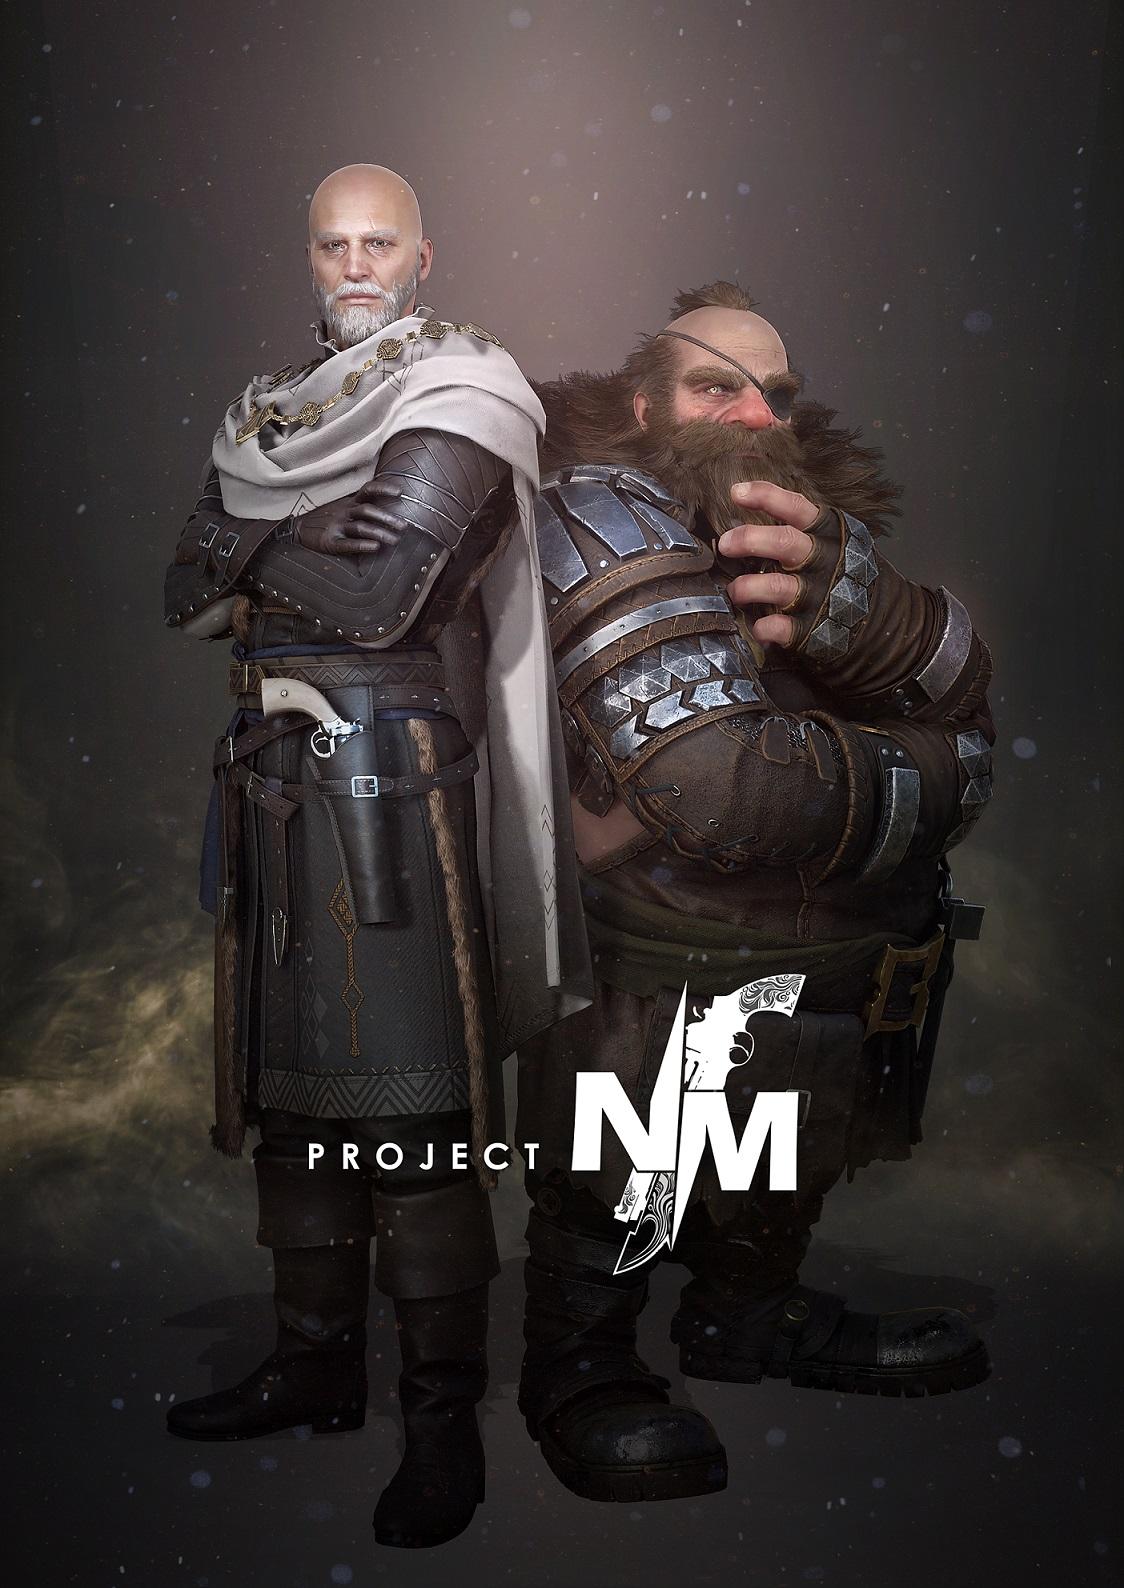 ProjectNM